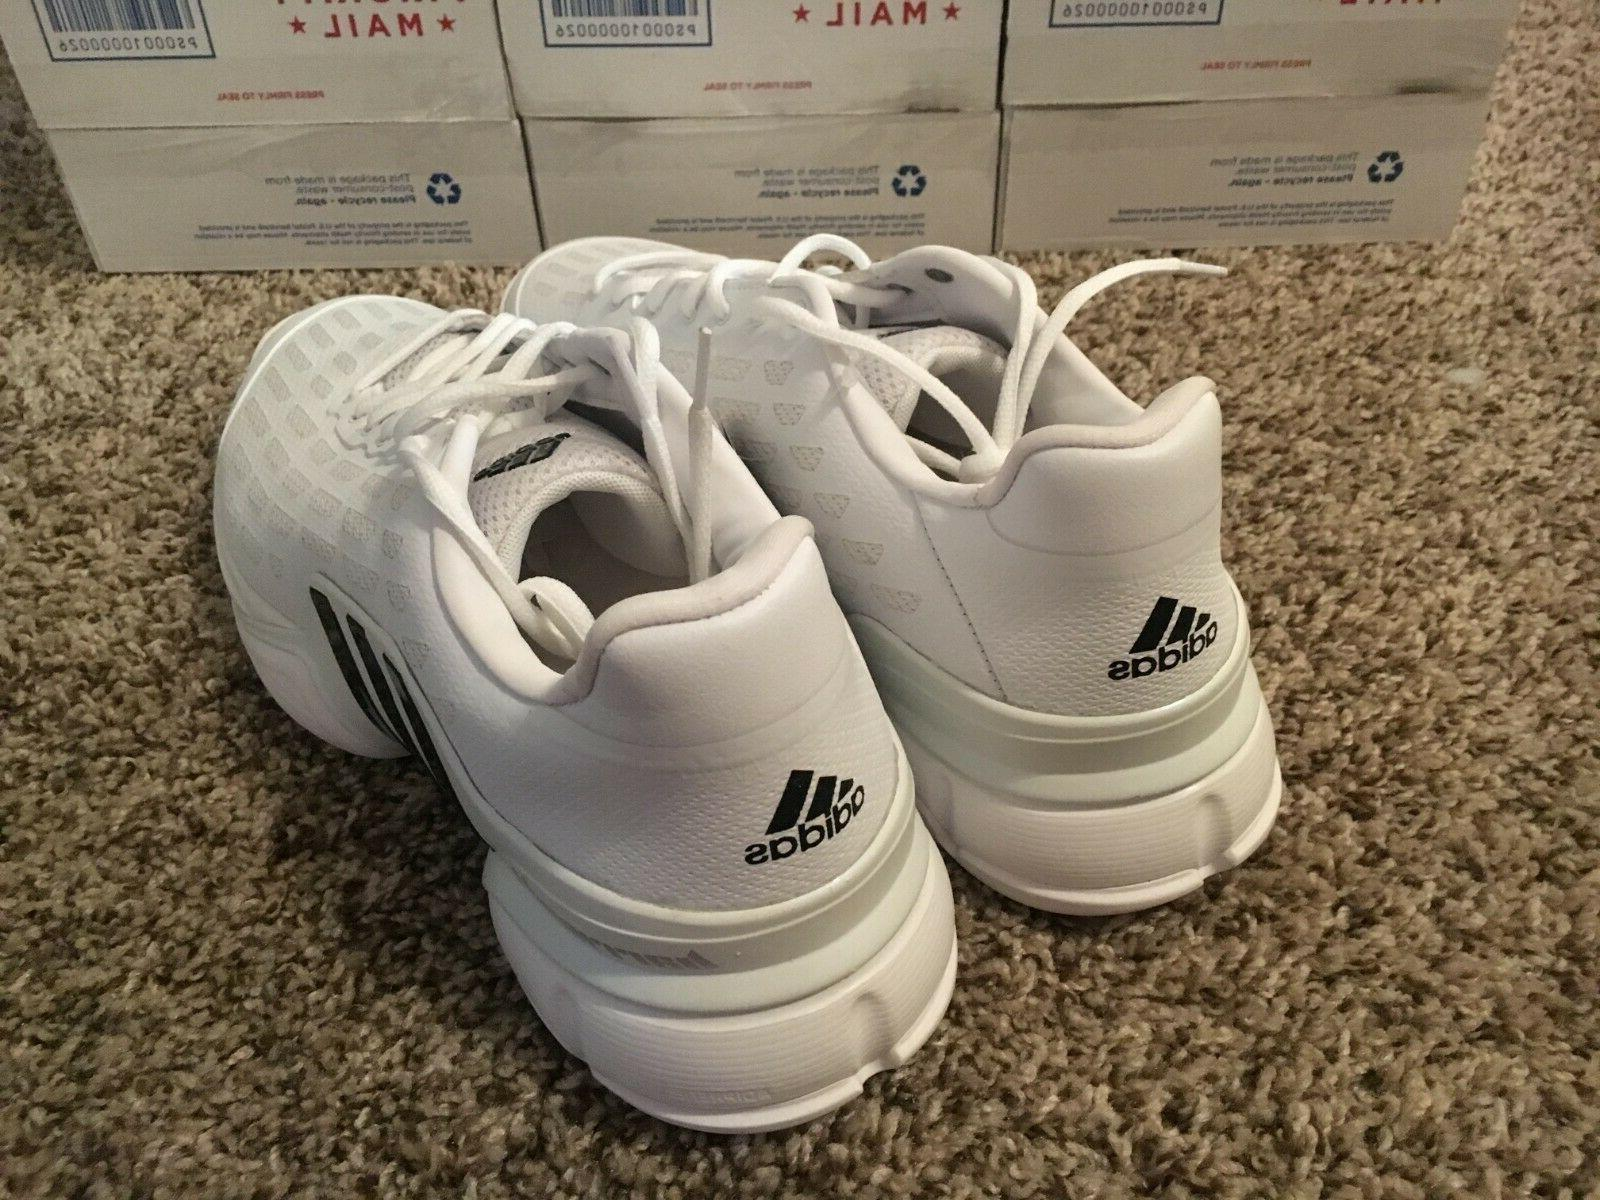 Adidas AF6790 Tennis Size White